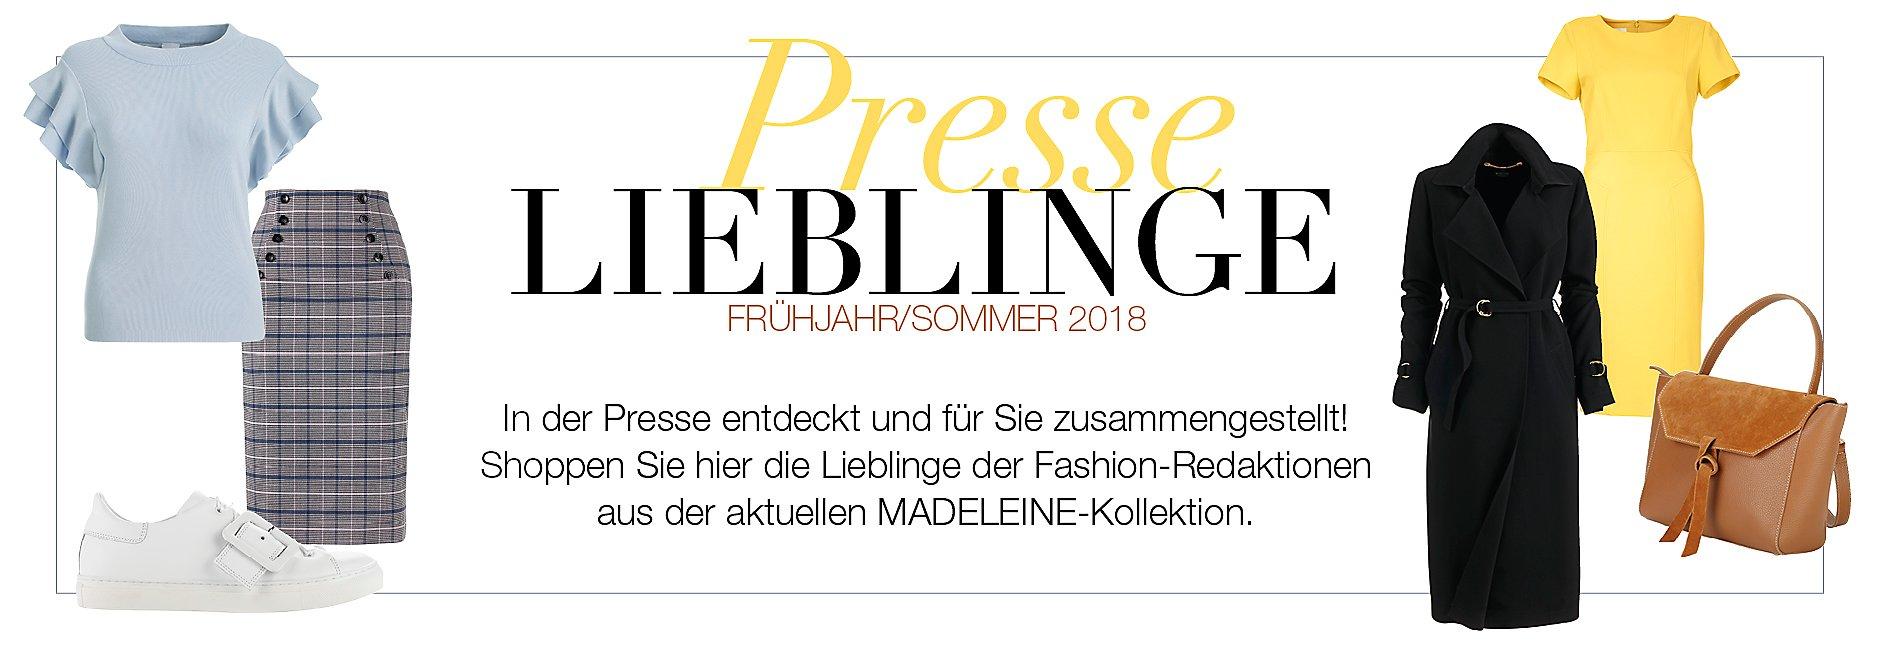 Presse Lieblinge